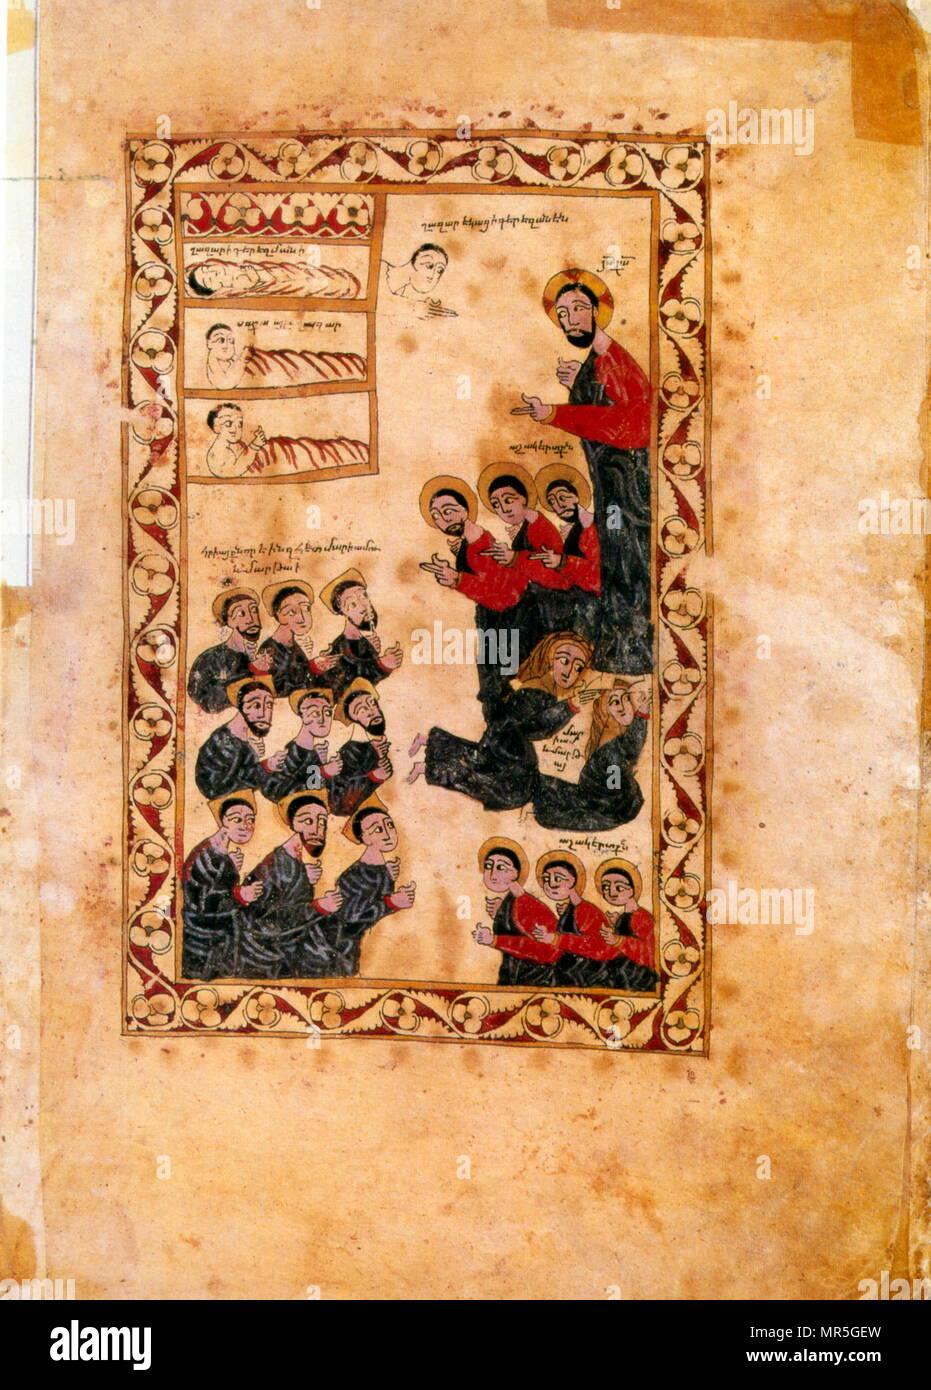 14th century, Armenian Evangelical manuscript, the resurrection of Lazarus - Stock Image